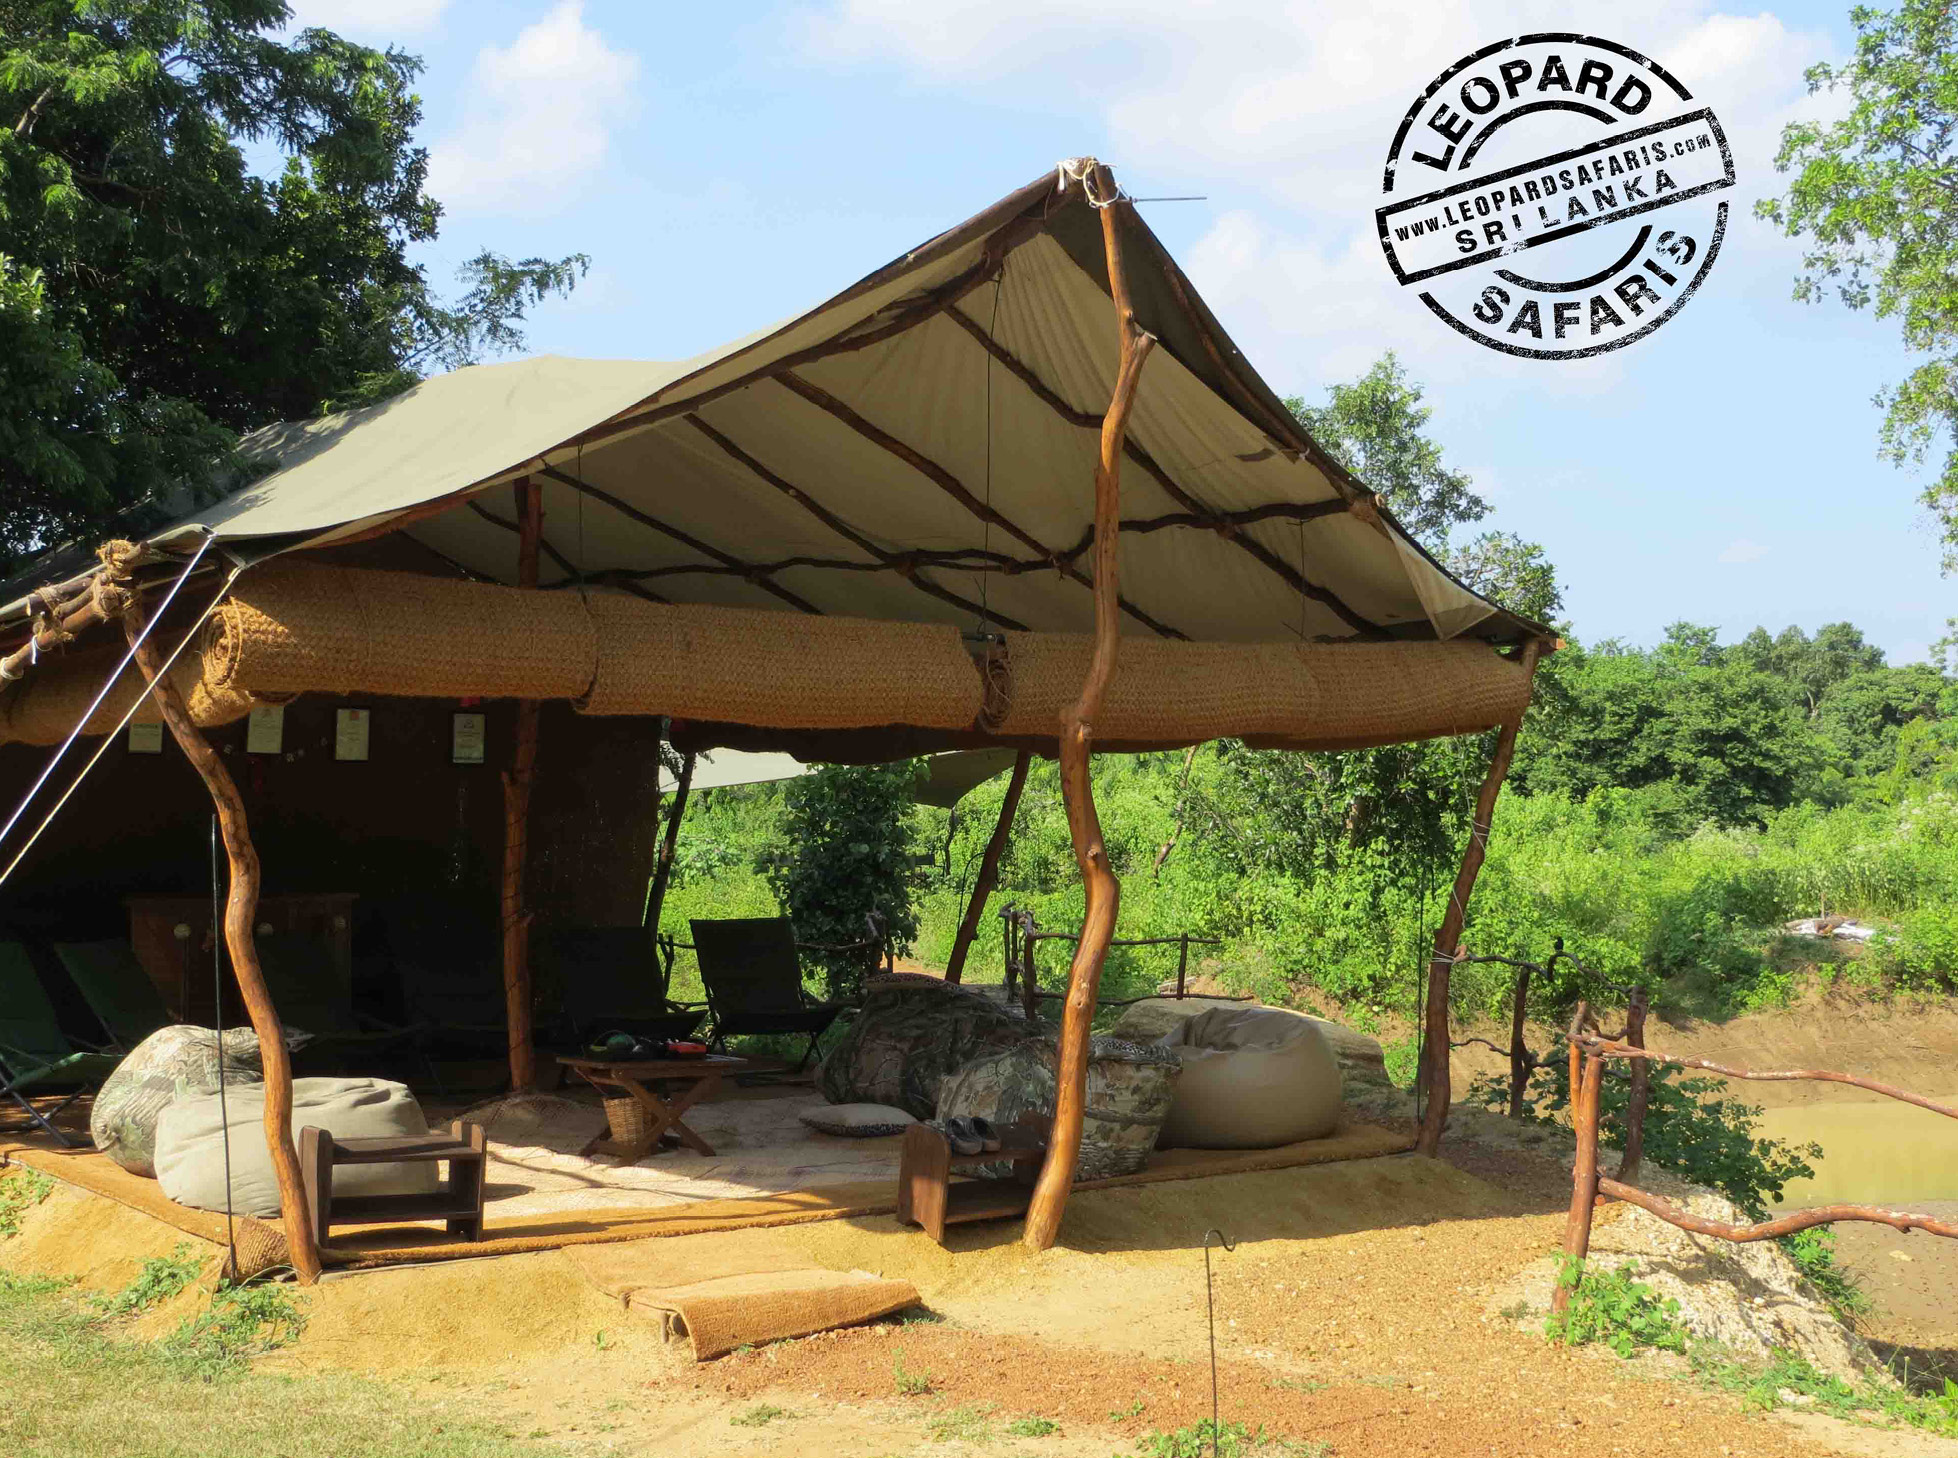 noel-rodrigo-leopard-safari-yala-national-park-sri-lanka-camp